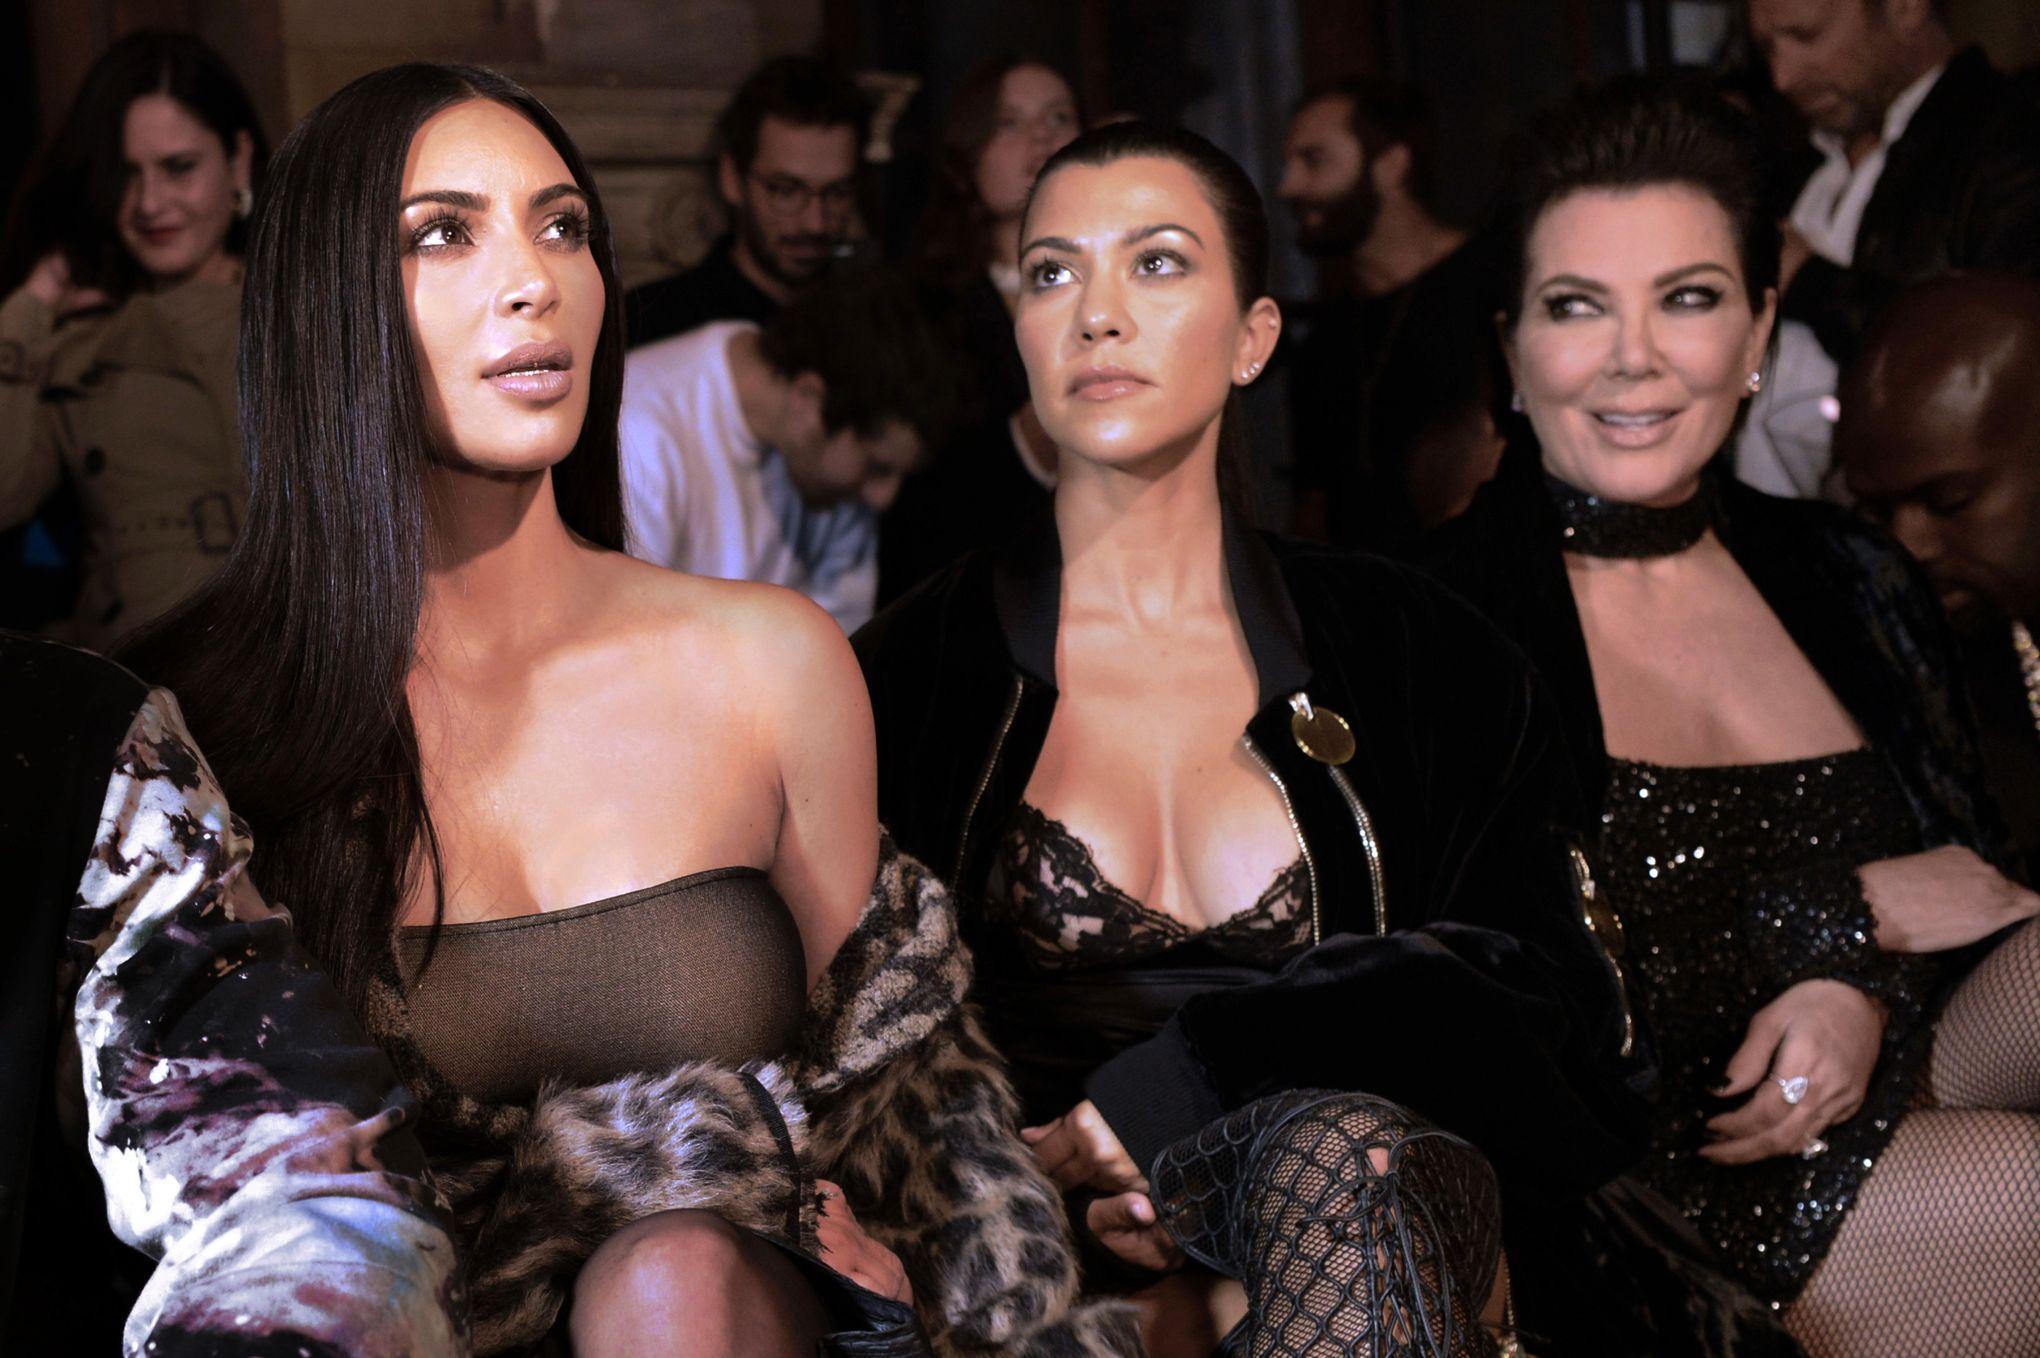 Braquage de kim kardashian le chauffeur de la star en garde à vue